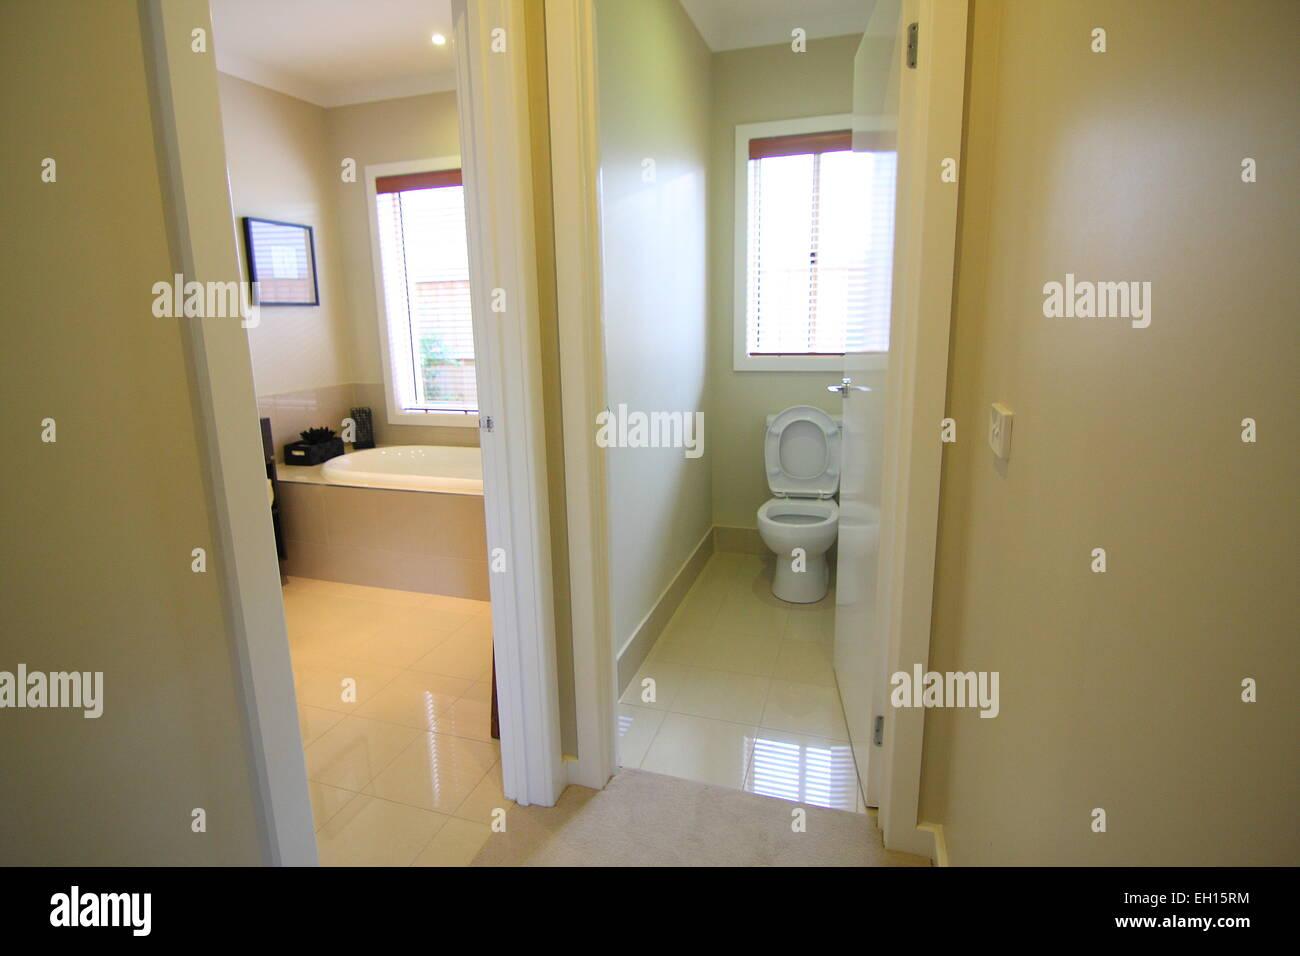 Modernes Bad mit separatem WC Stockfoto, Bild: 79317160 - Alamy